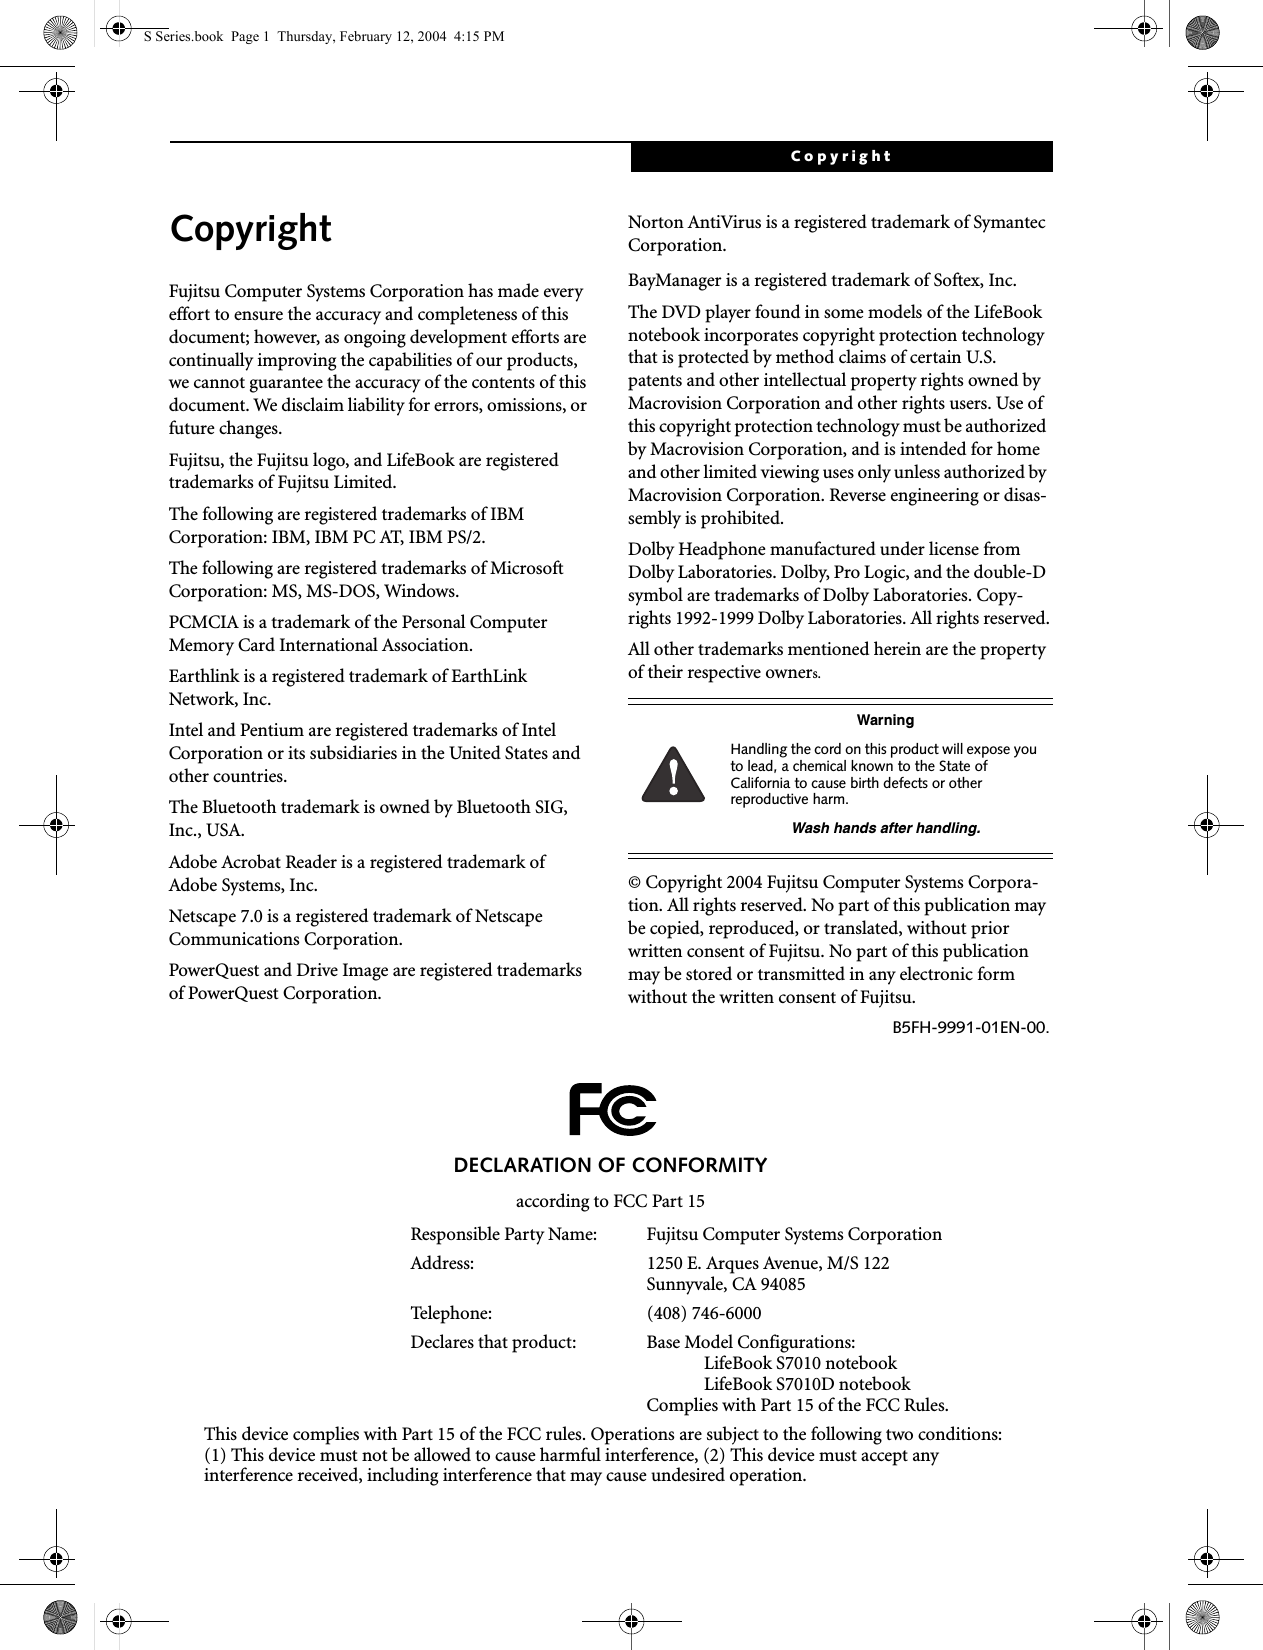 Fujitsu WB0012 LIFEBOOK S SERIES WITH CAL2 11 ABG WLAN & BT User